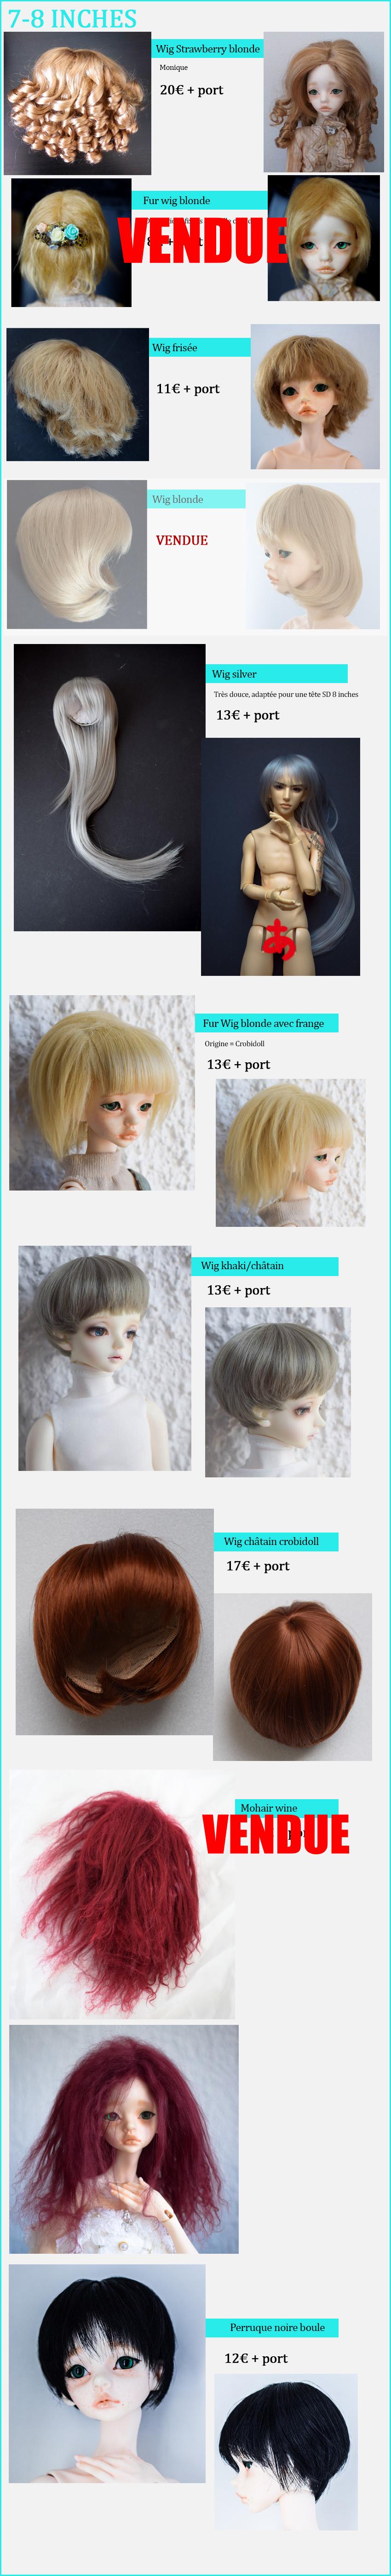 [vends] News ! Wigs&Yeux 12-20mm & 5-6 à 9-10 50249392326_95a06f5f4a_o